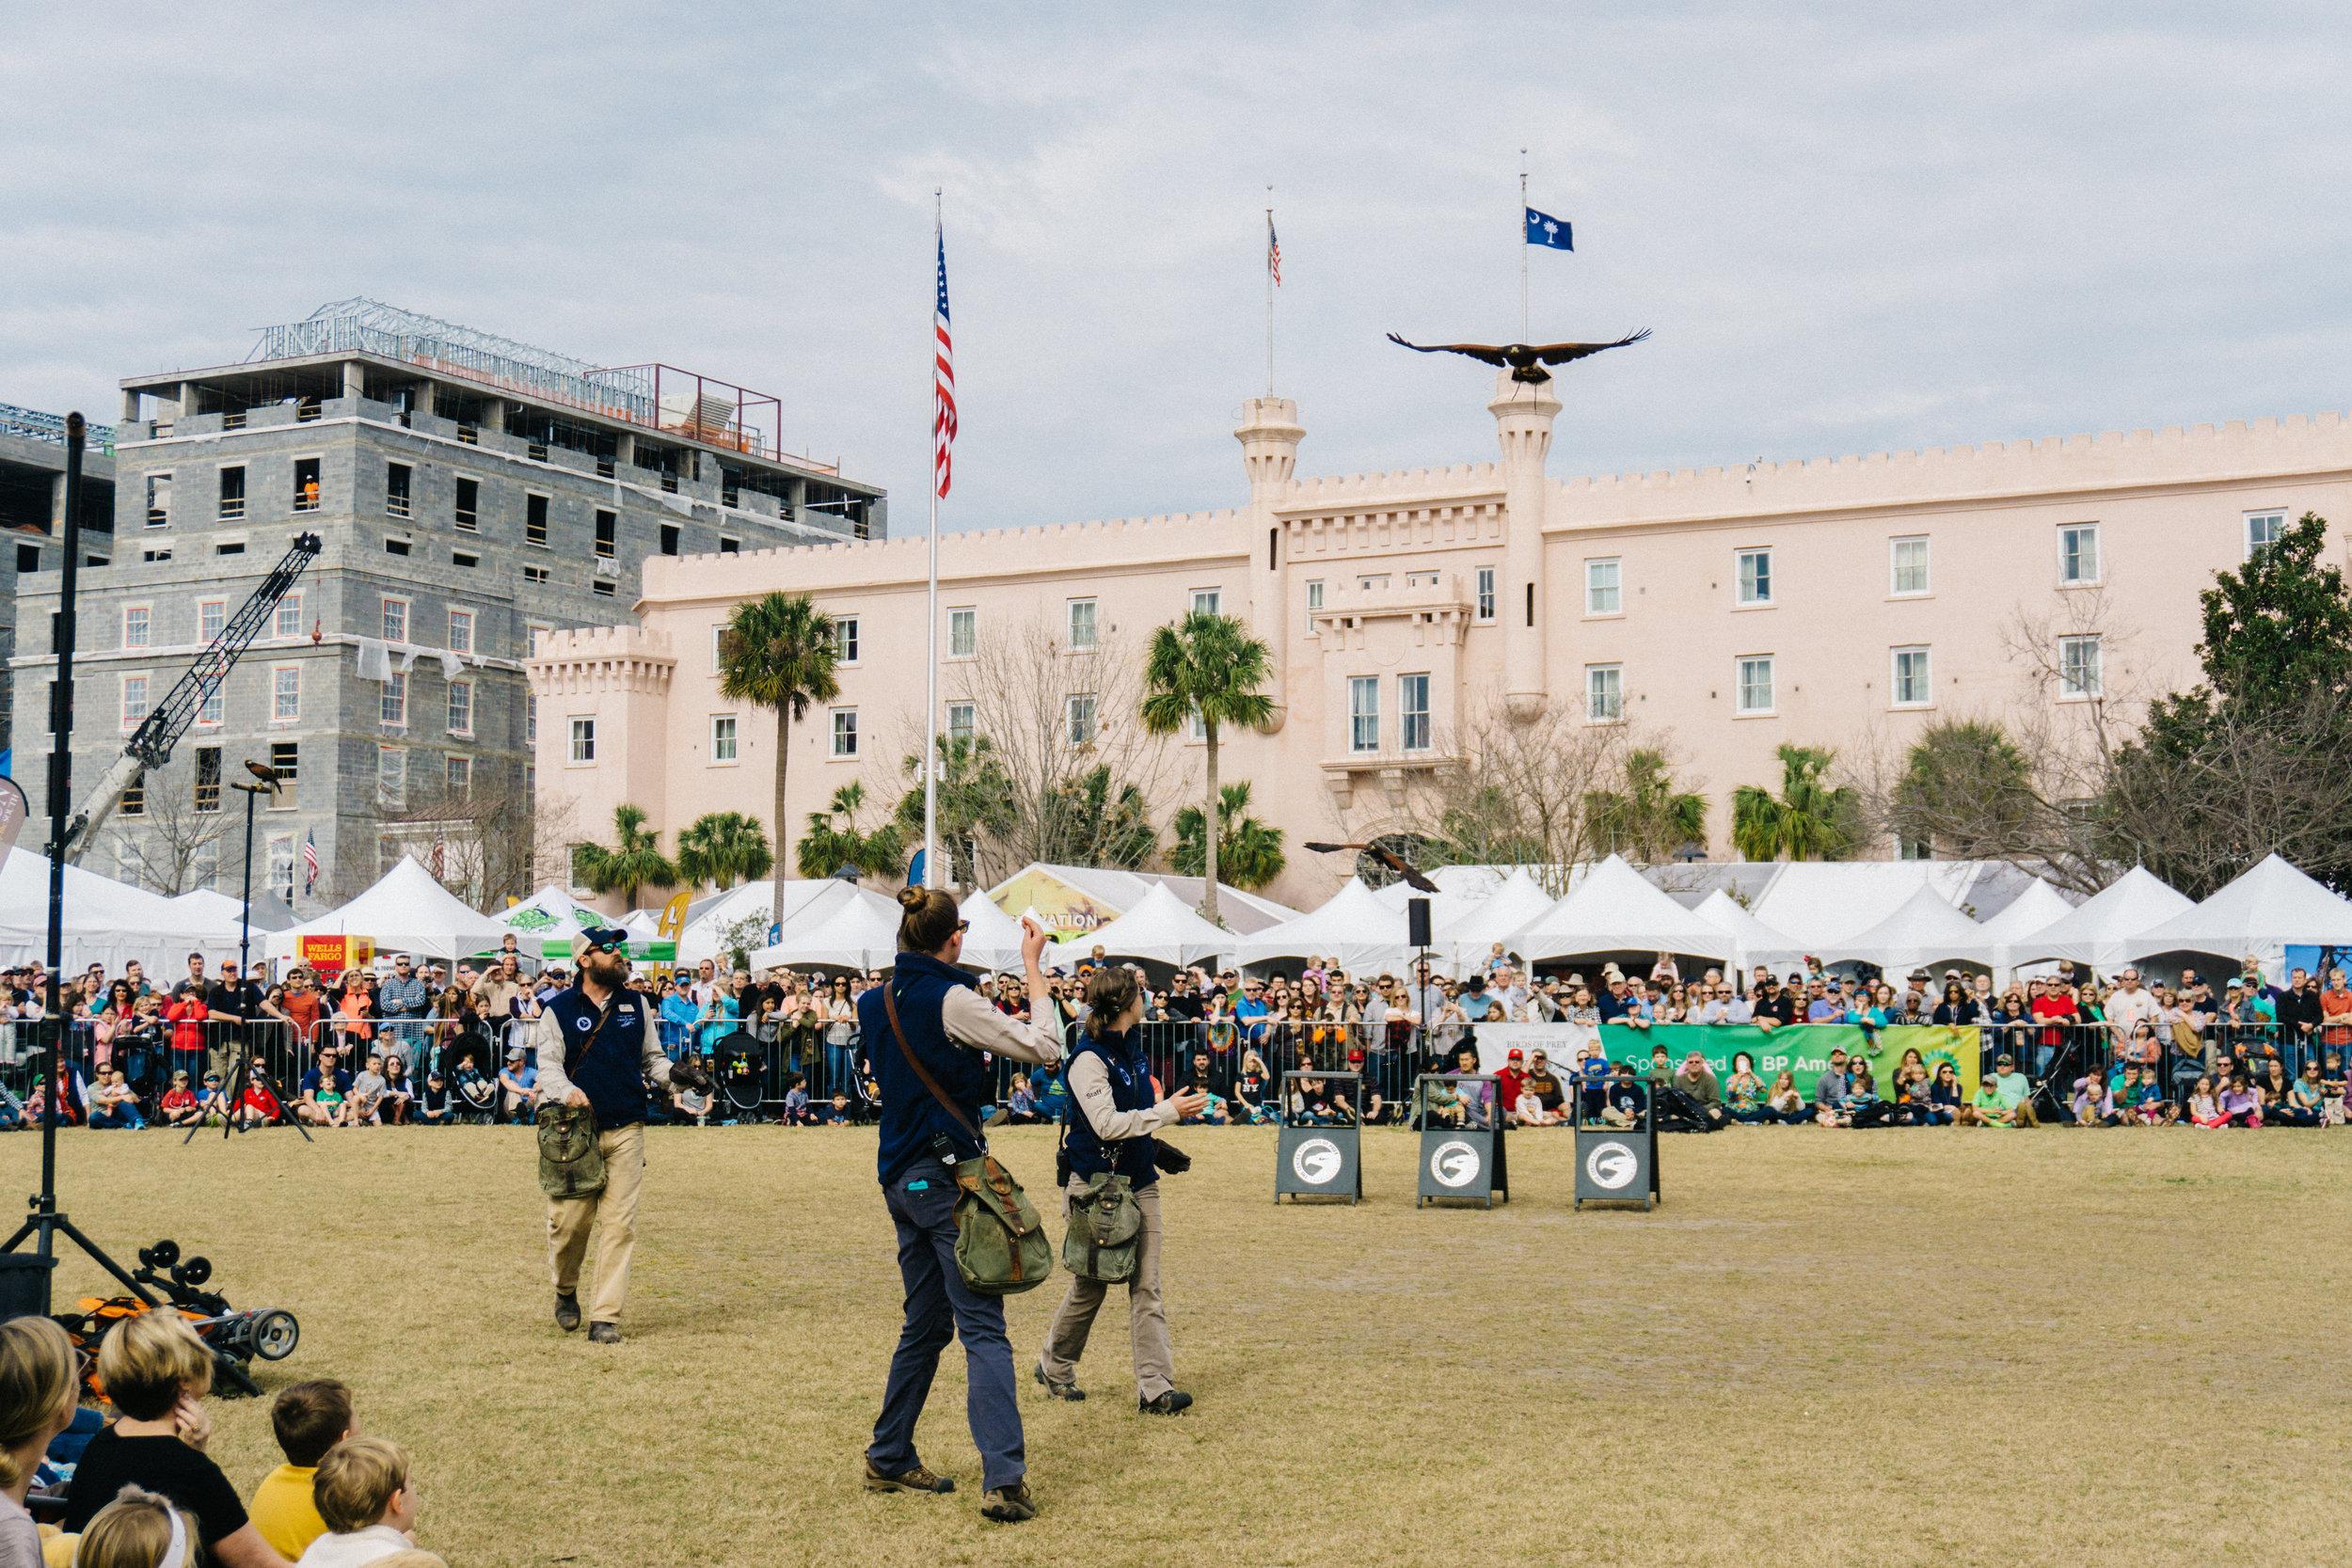 Birds of Prey in flight demonstration